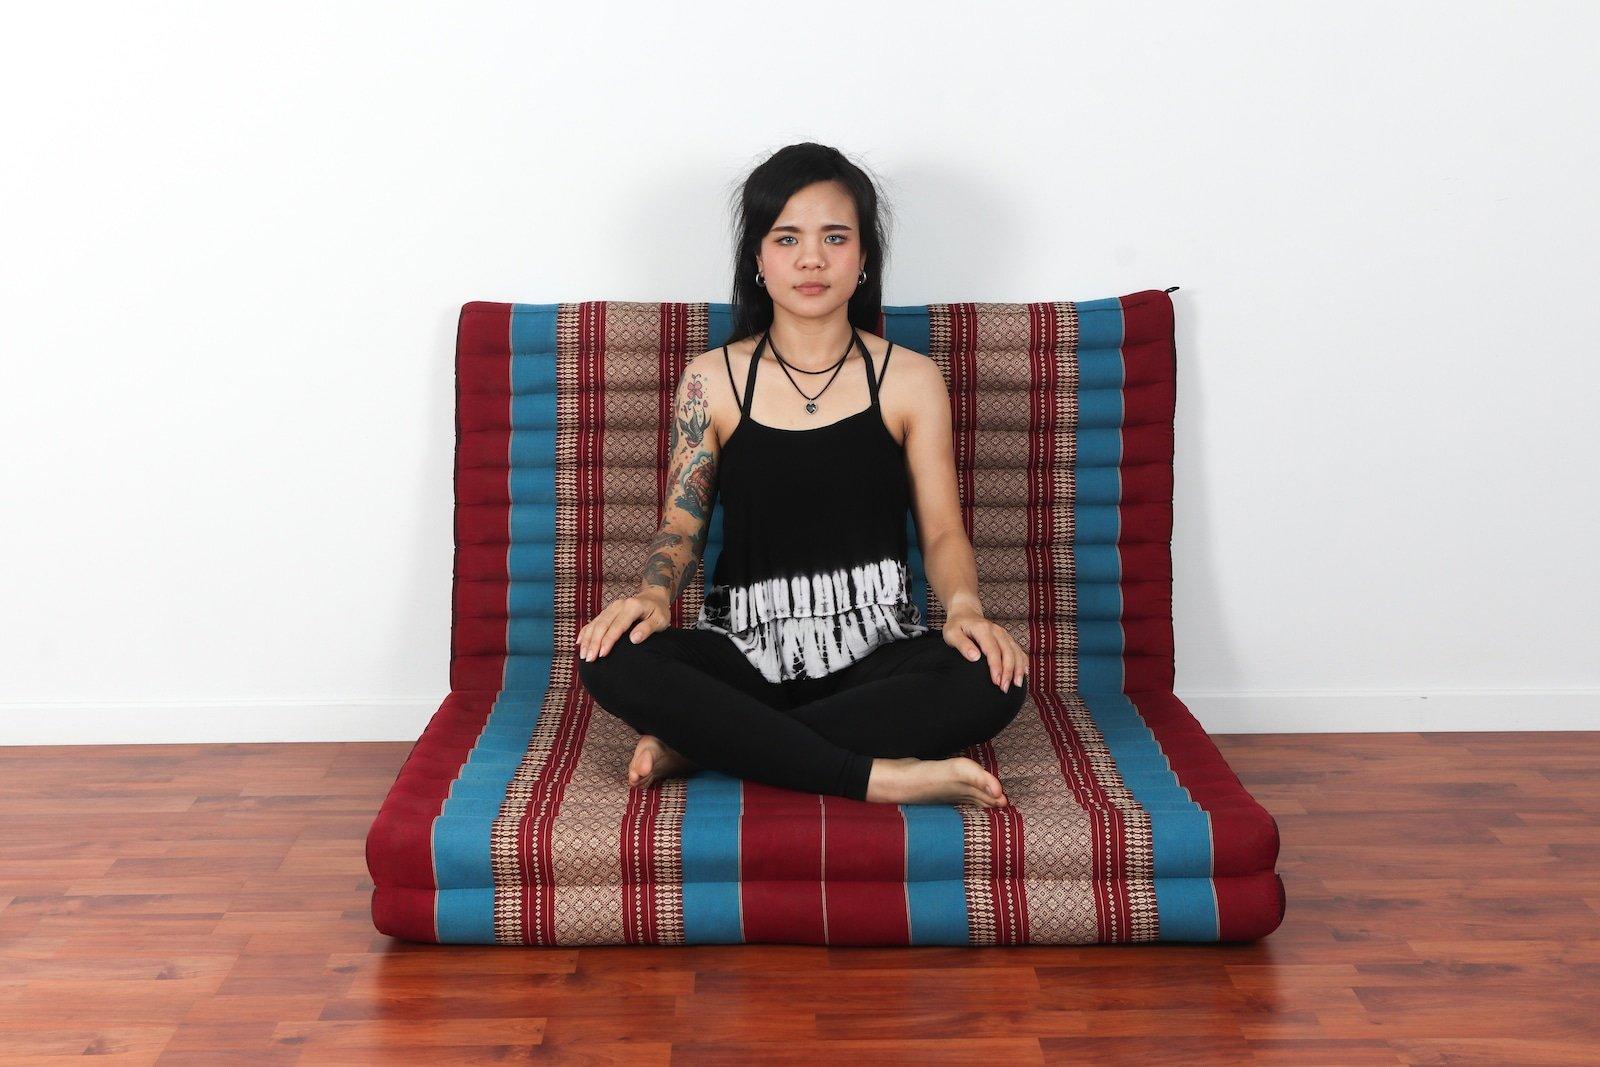 Leewadee Thai Massage Mat XL, 82x46x3 inches, Kapok, Blue red by Leewadee (Image #3)